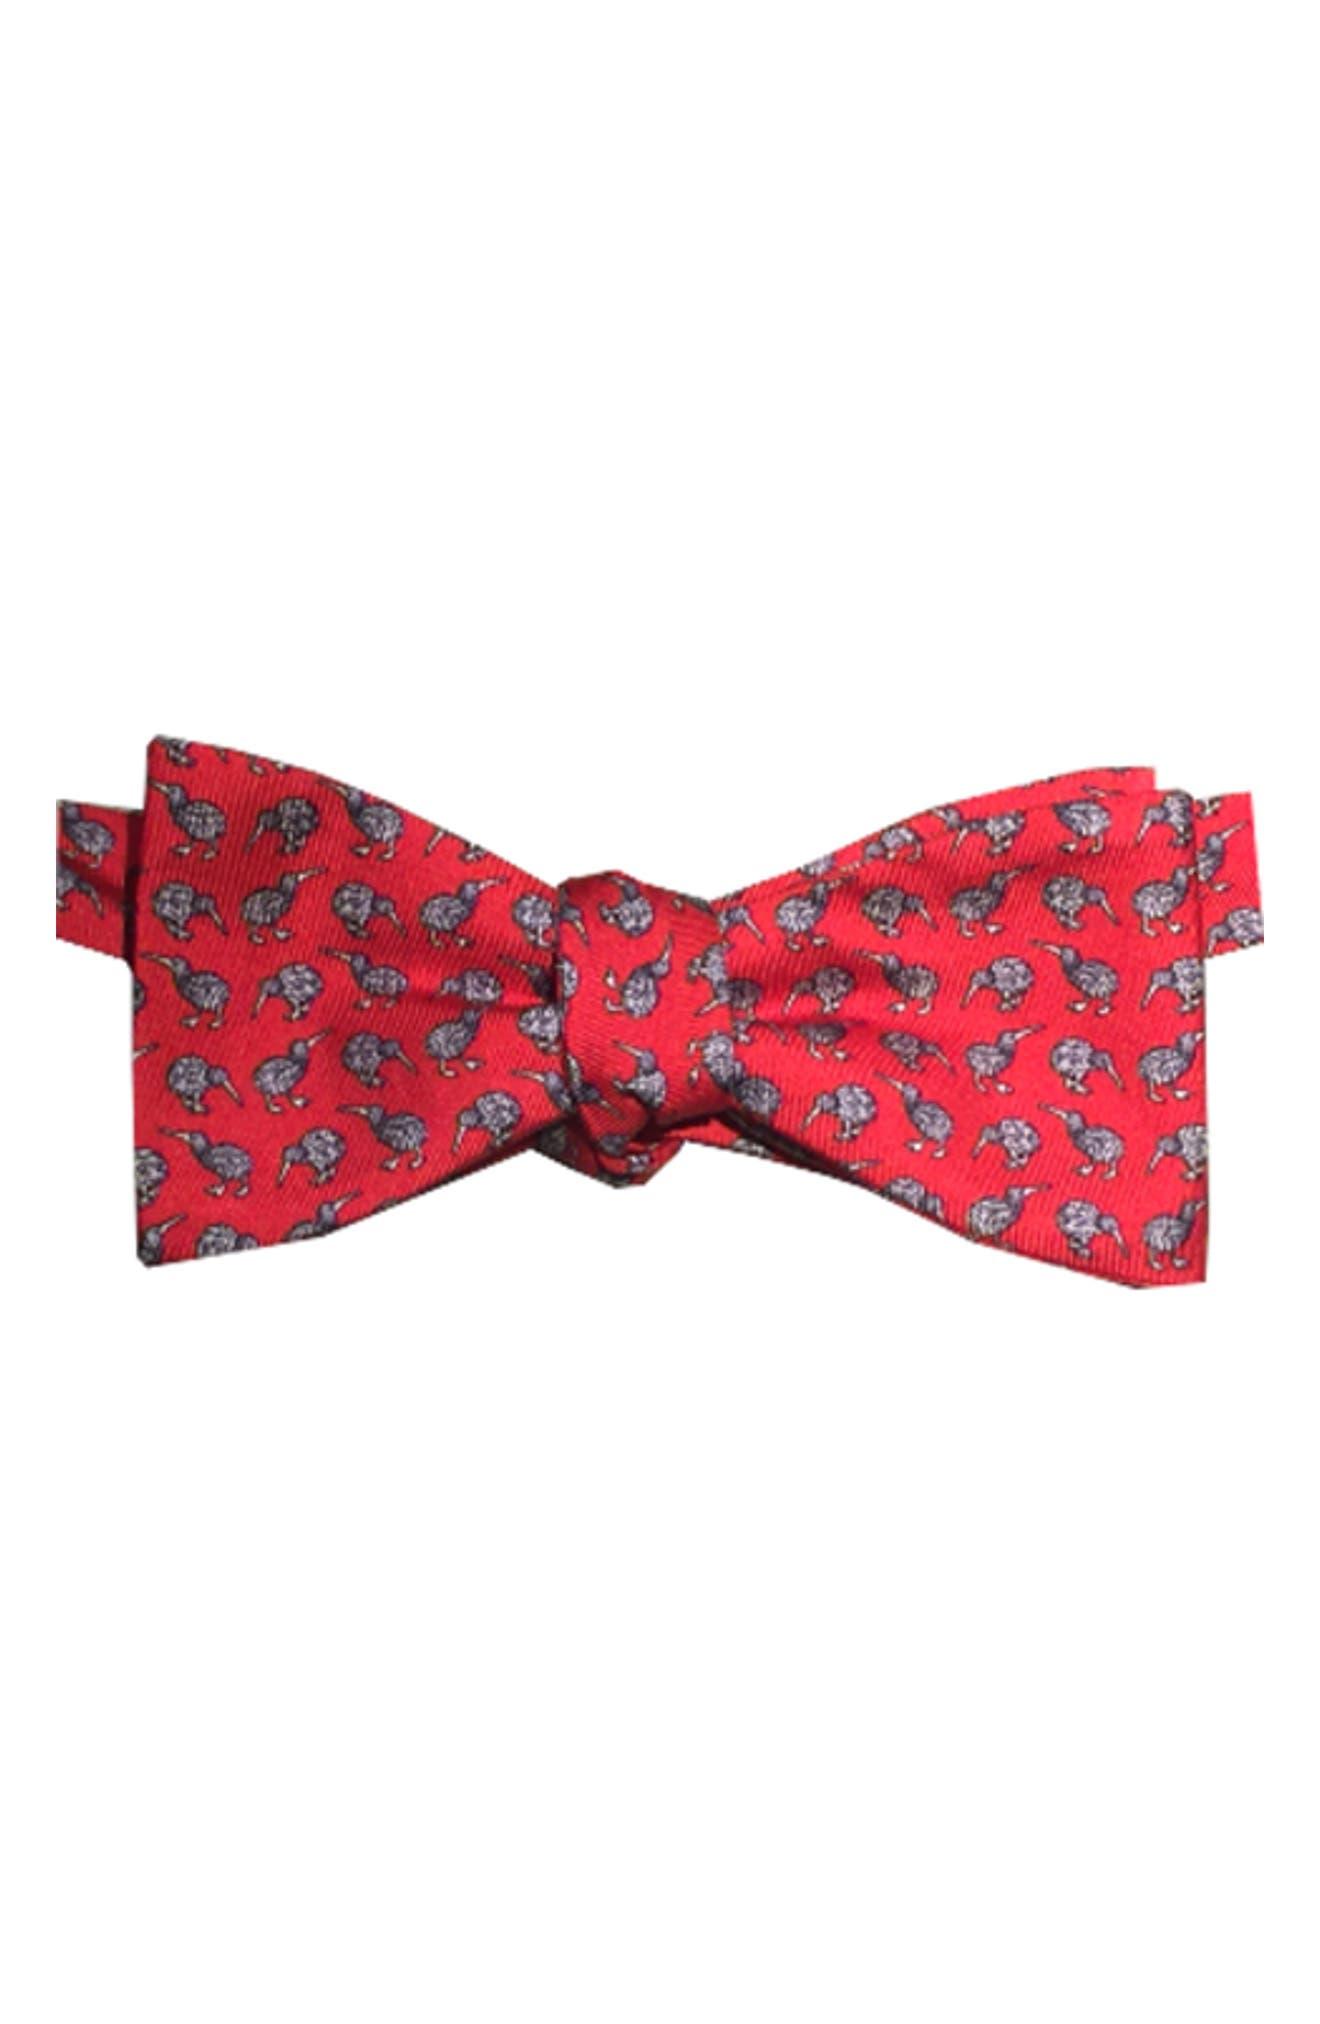 Cheeky Kiwi Silk Bow Tie,                             Main thumbnail 1, color,                             620